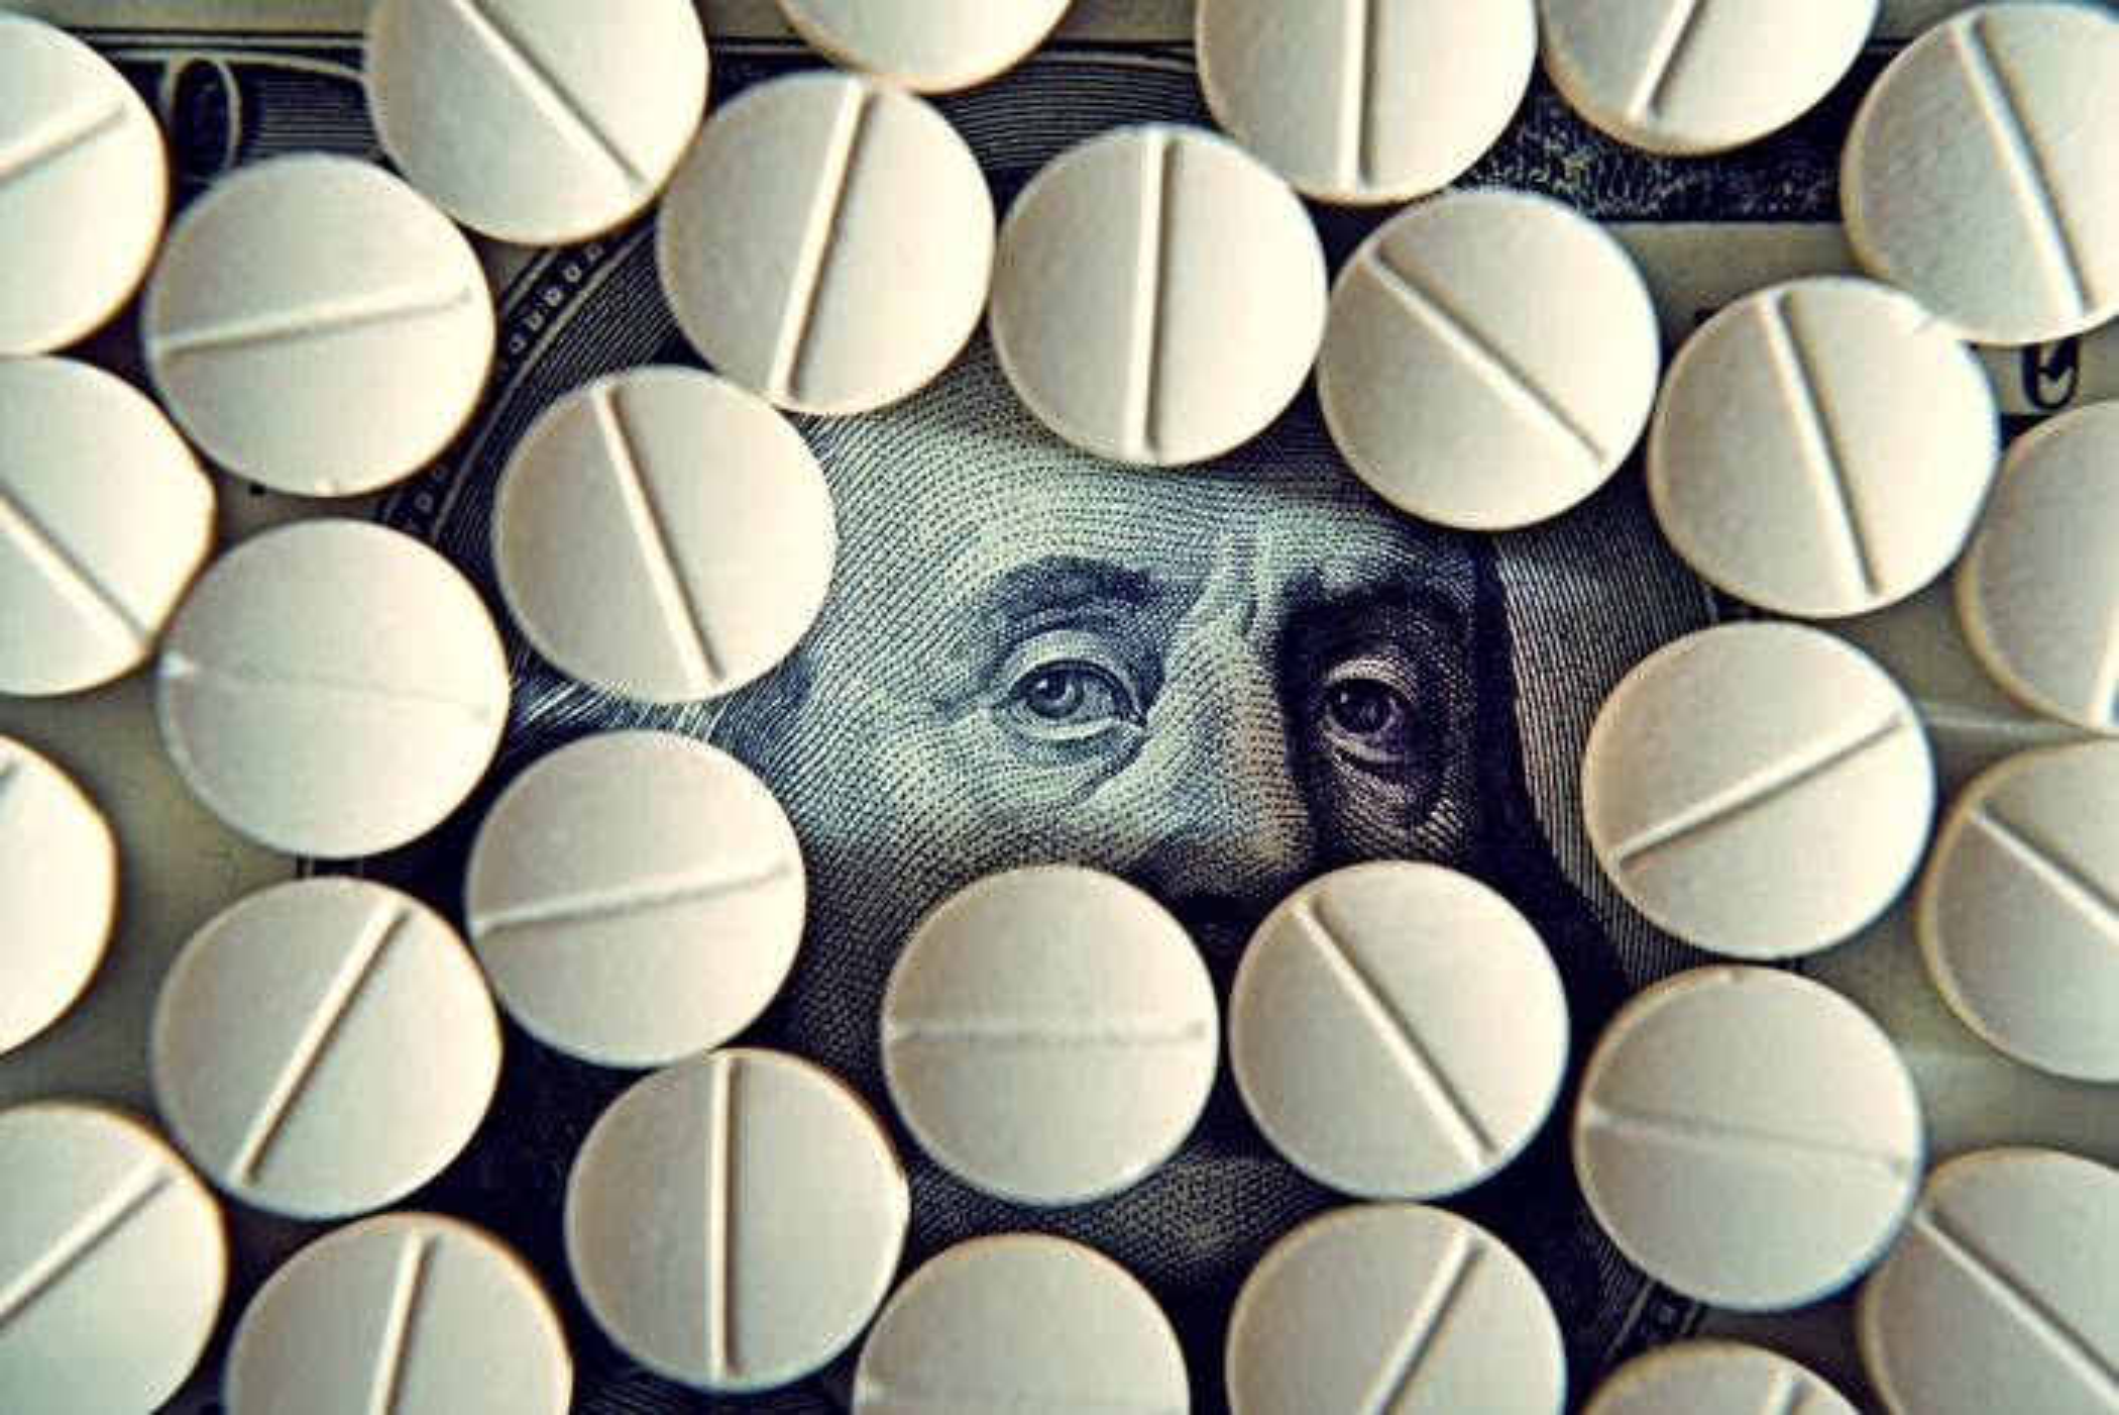 Benjamin Franklin hiding under a lot of prescription tablets.